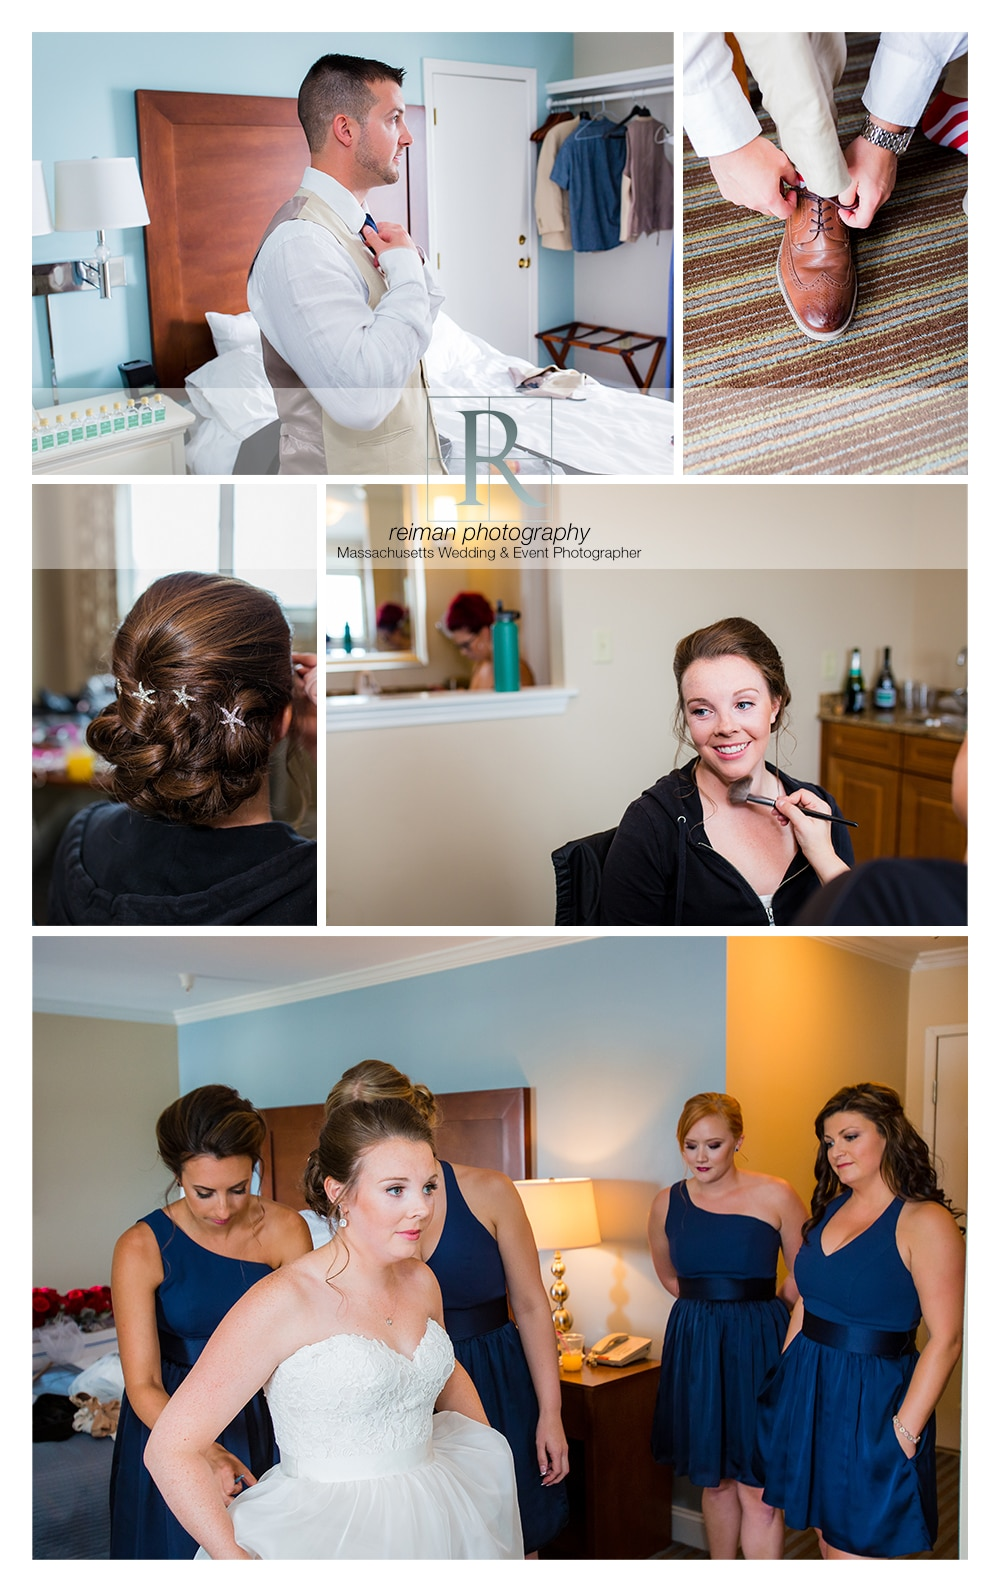 Nautical Wedding, Union Bluff, Reiman Photography